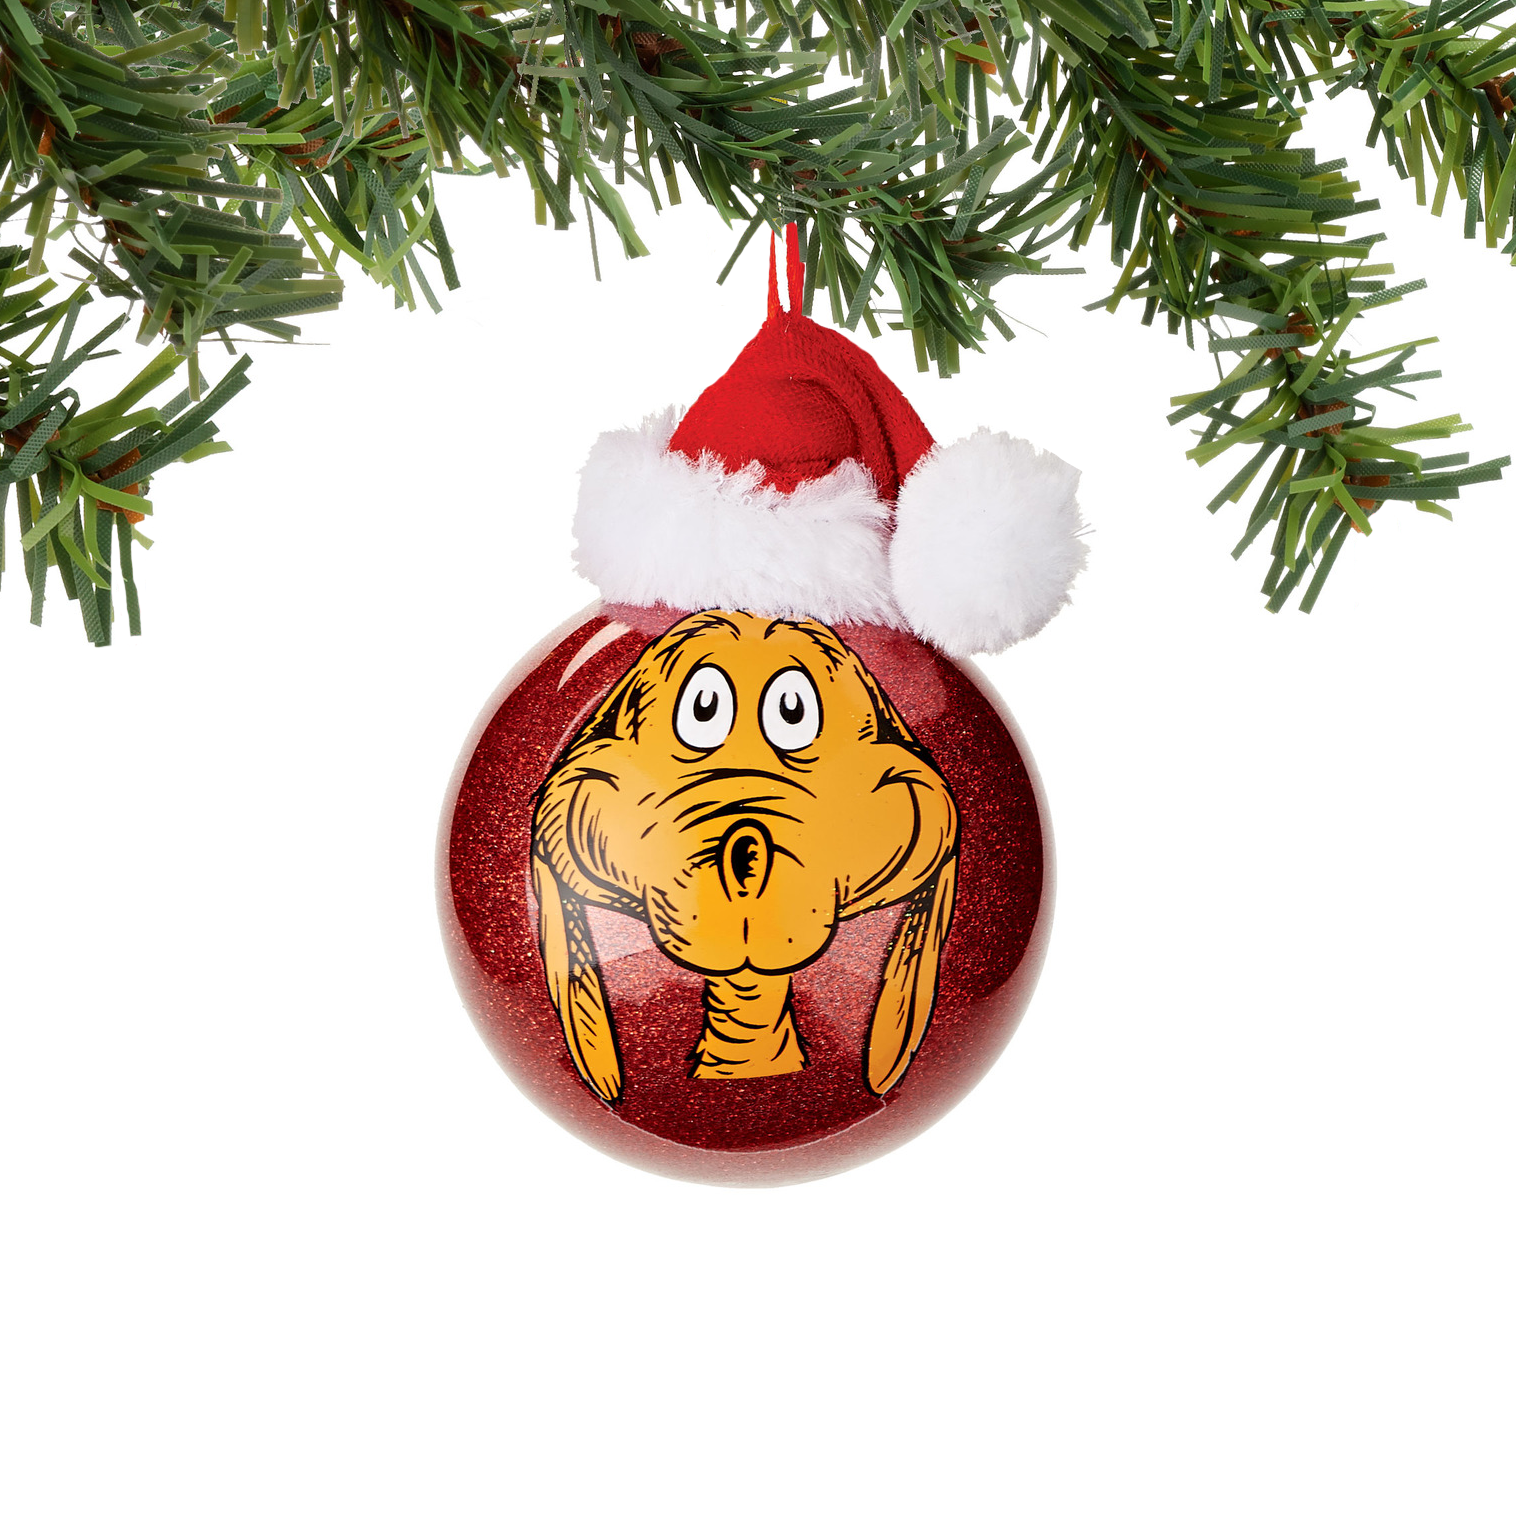 Max Selfie Ornament